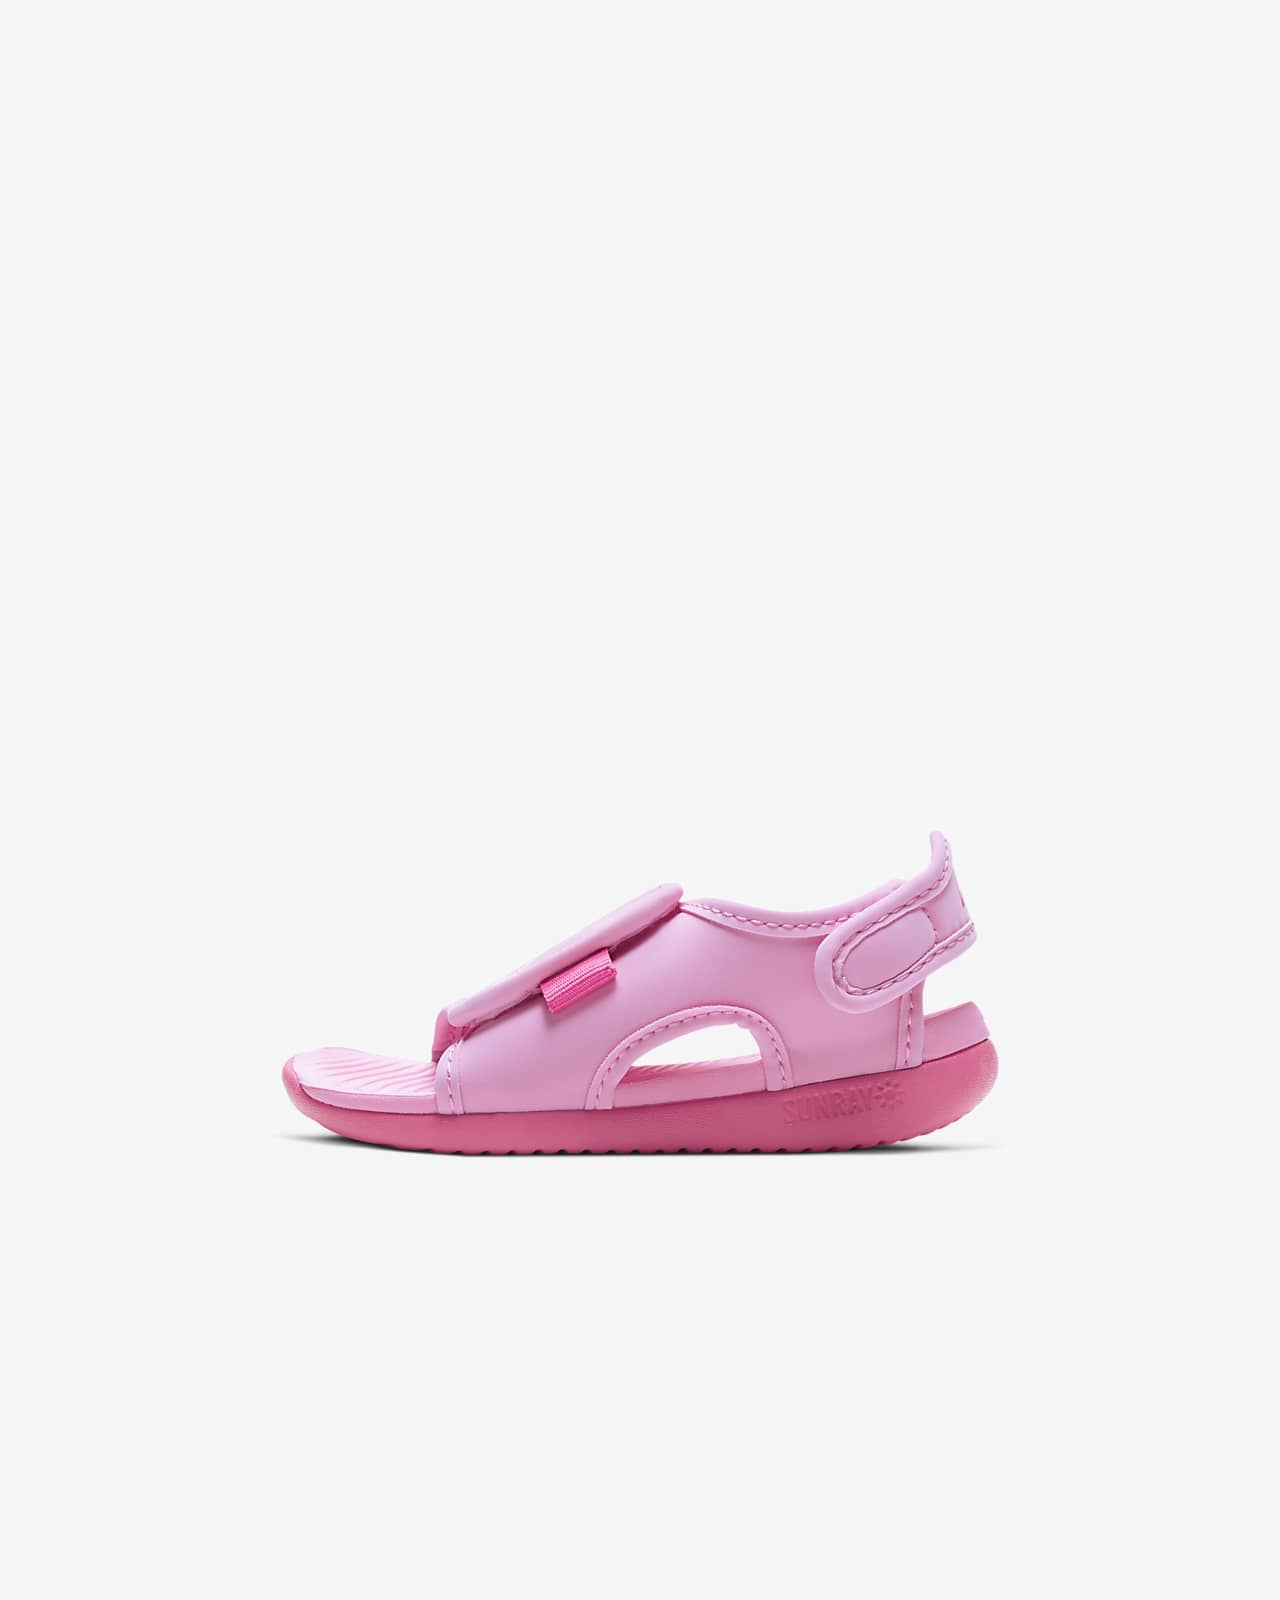 Sandalias para bebé e infantil Nike Sunray Adjust 5 V2